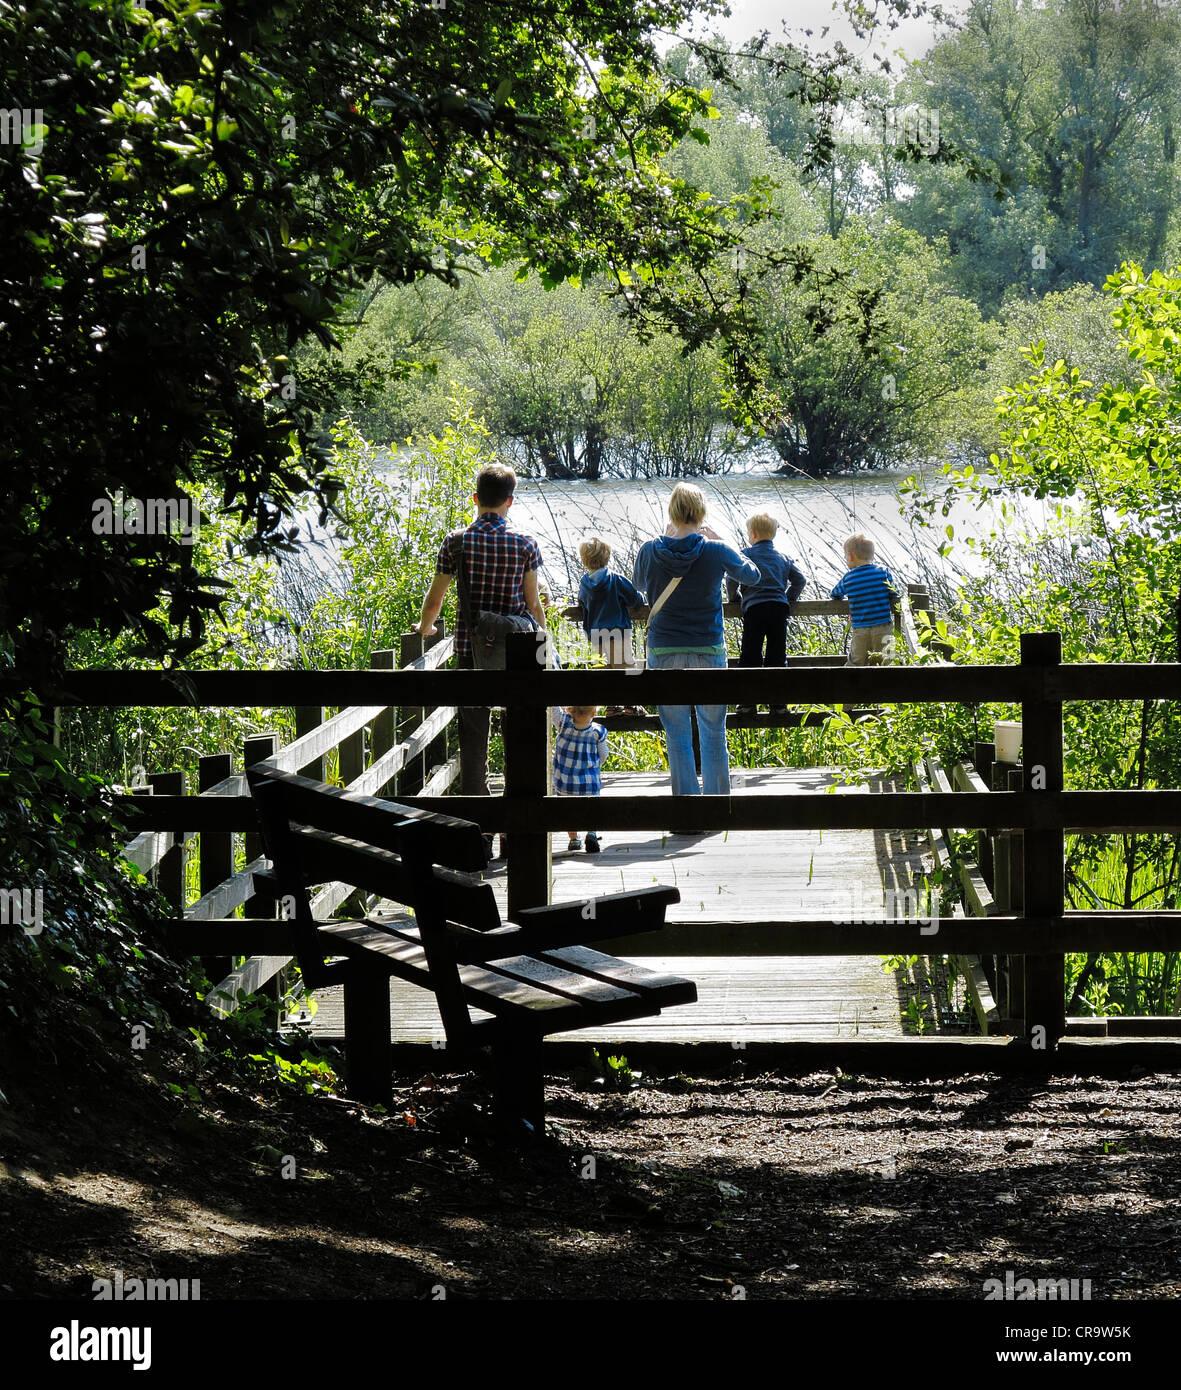 viewing-pier-at-milton-wildlife-park-cambridgeshire-CR9W5K.jpg